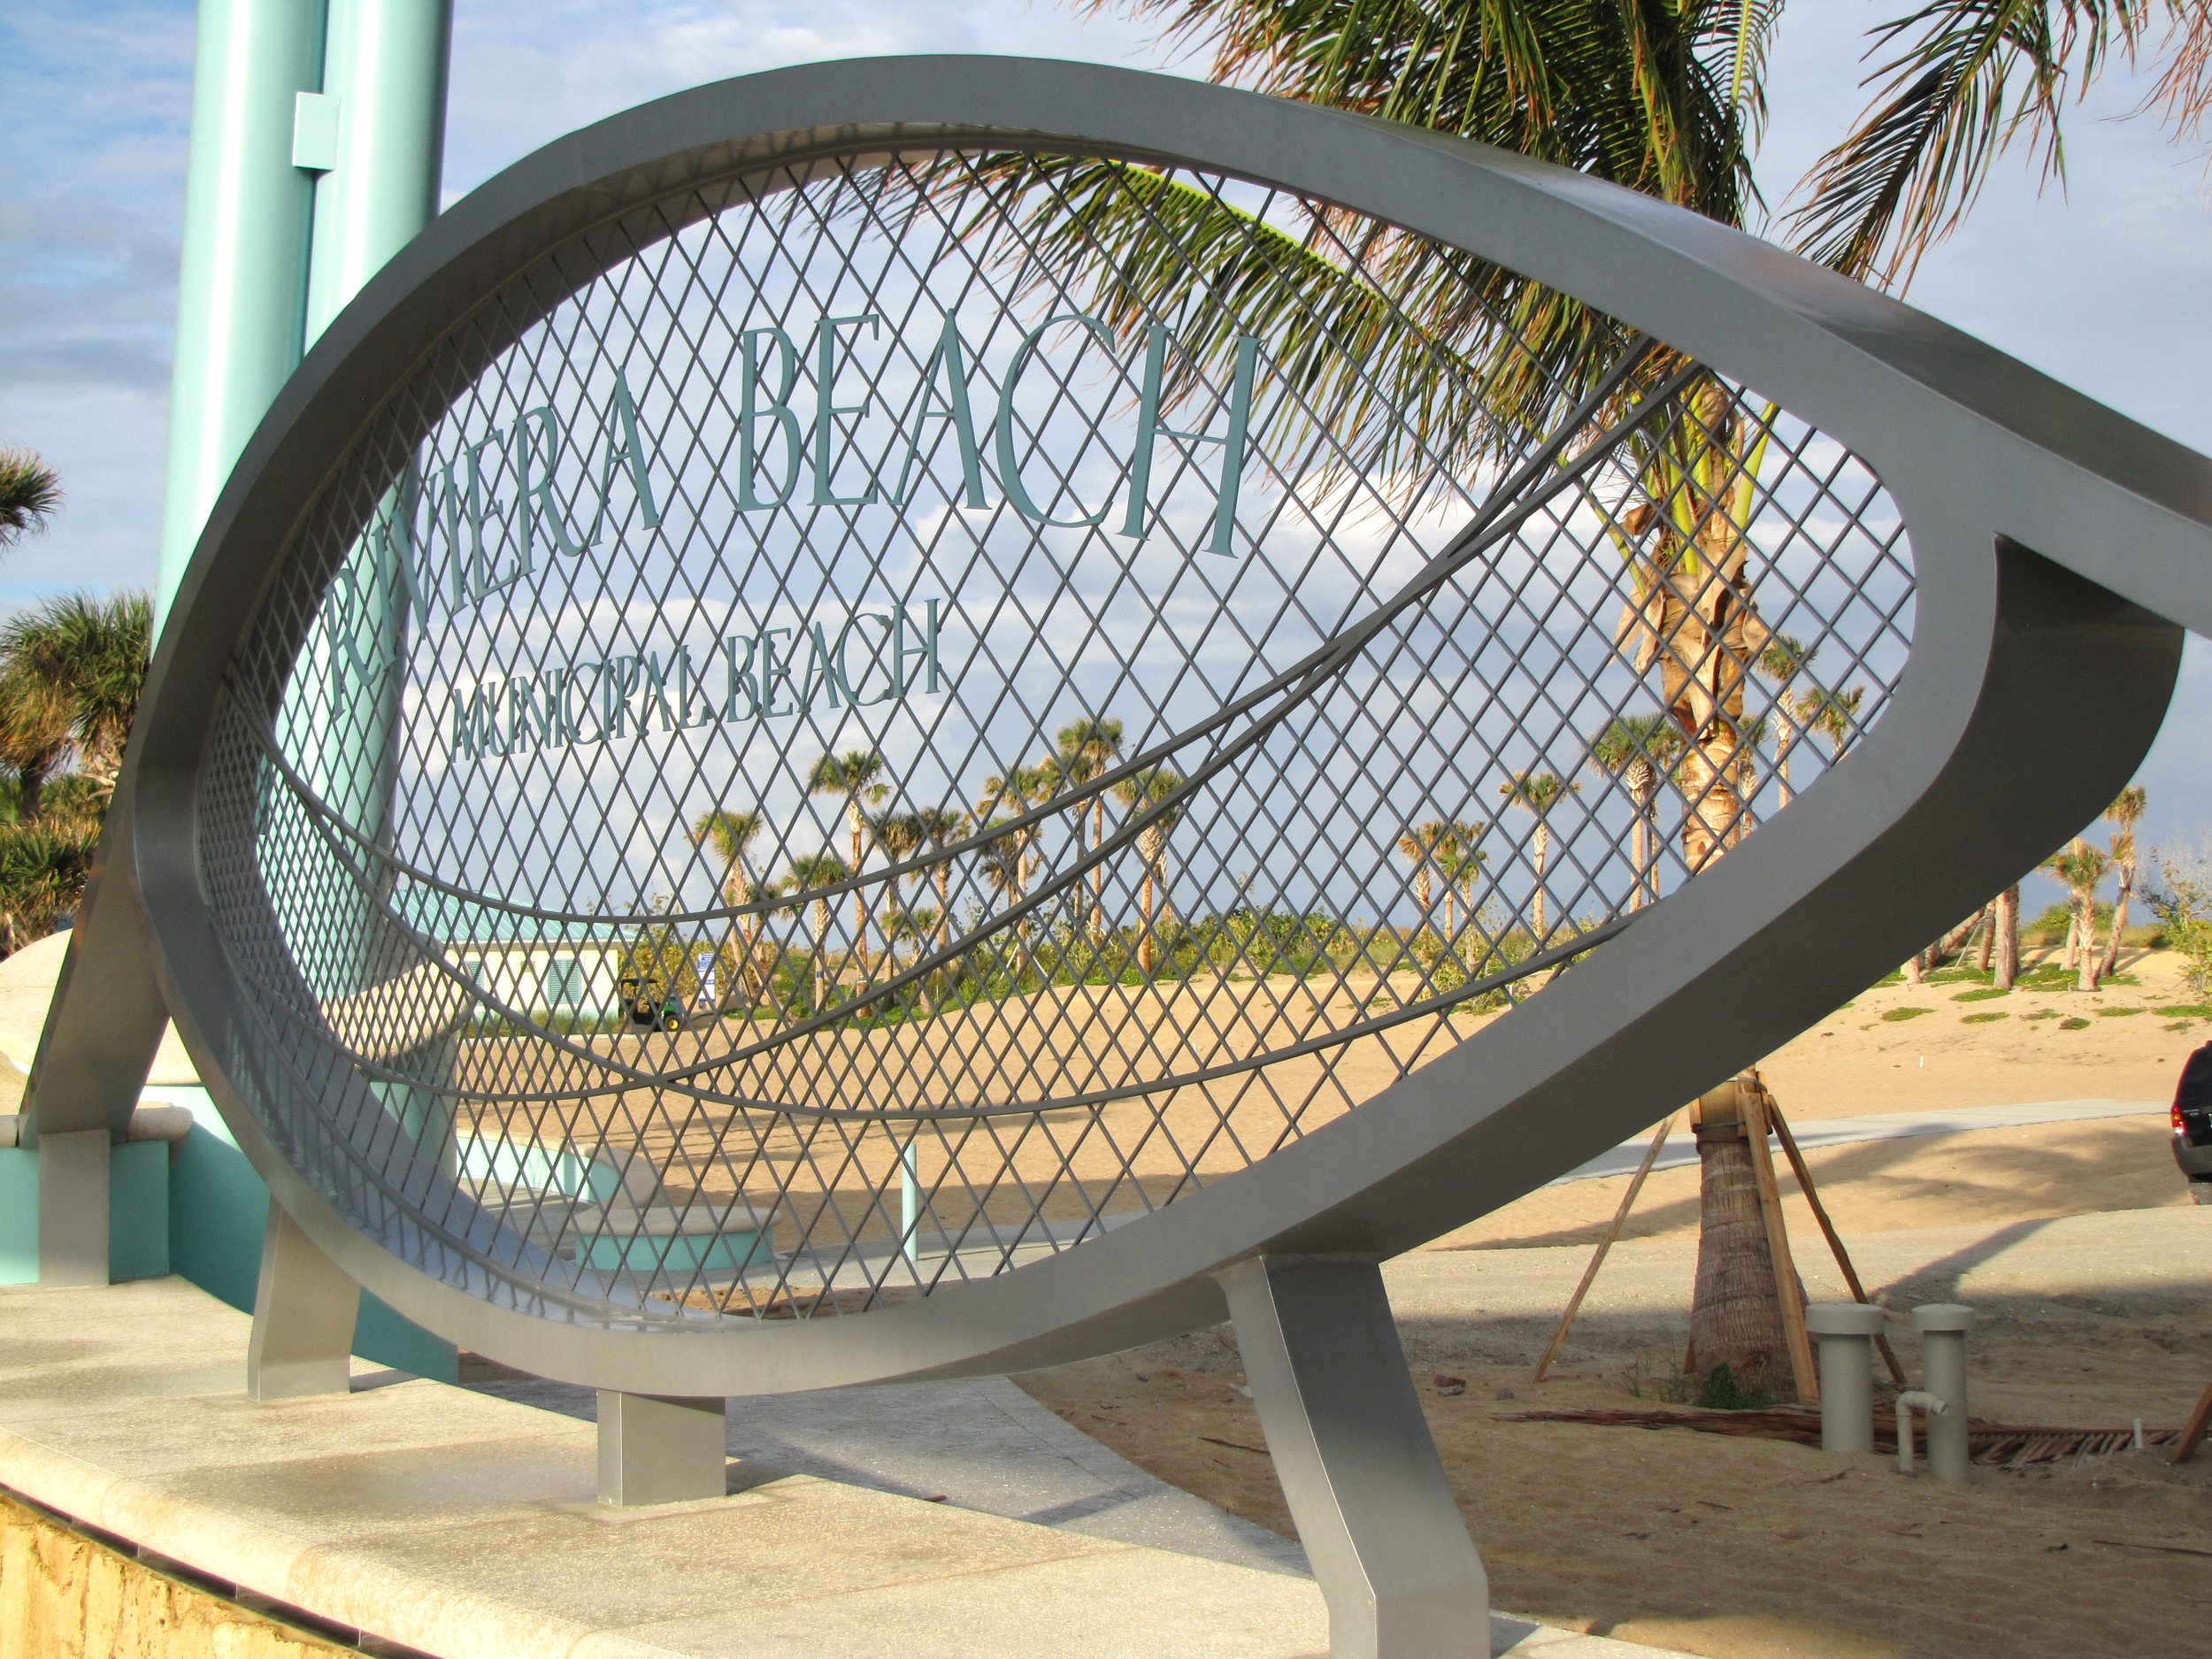 City of Riviera Beach Municipal Beach Park Ocean Mall Specialty Entry Sign.jpg